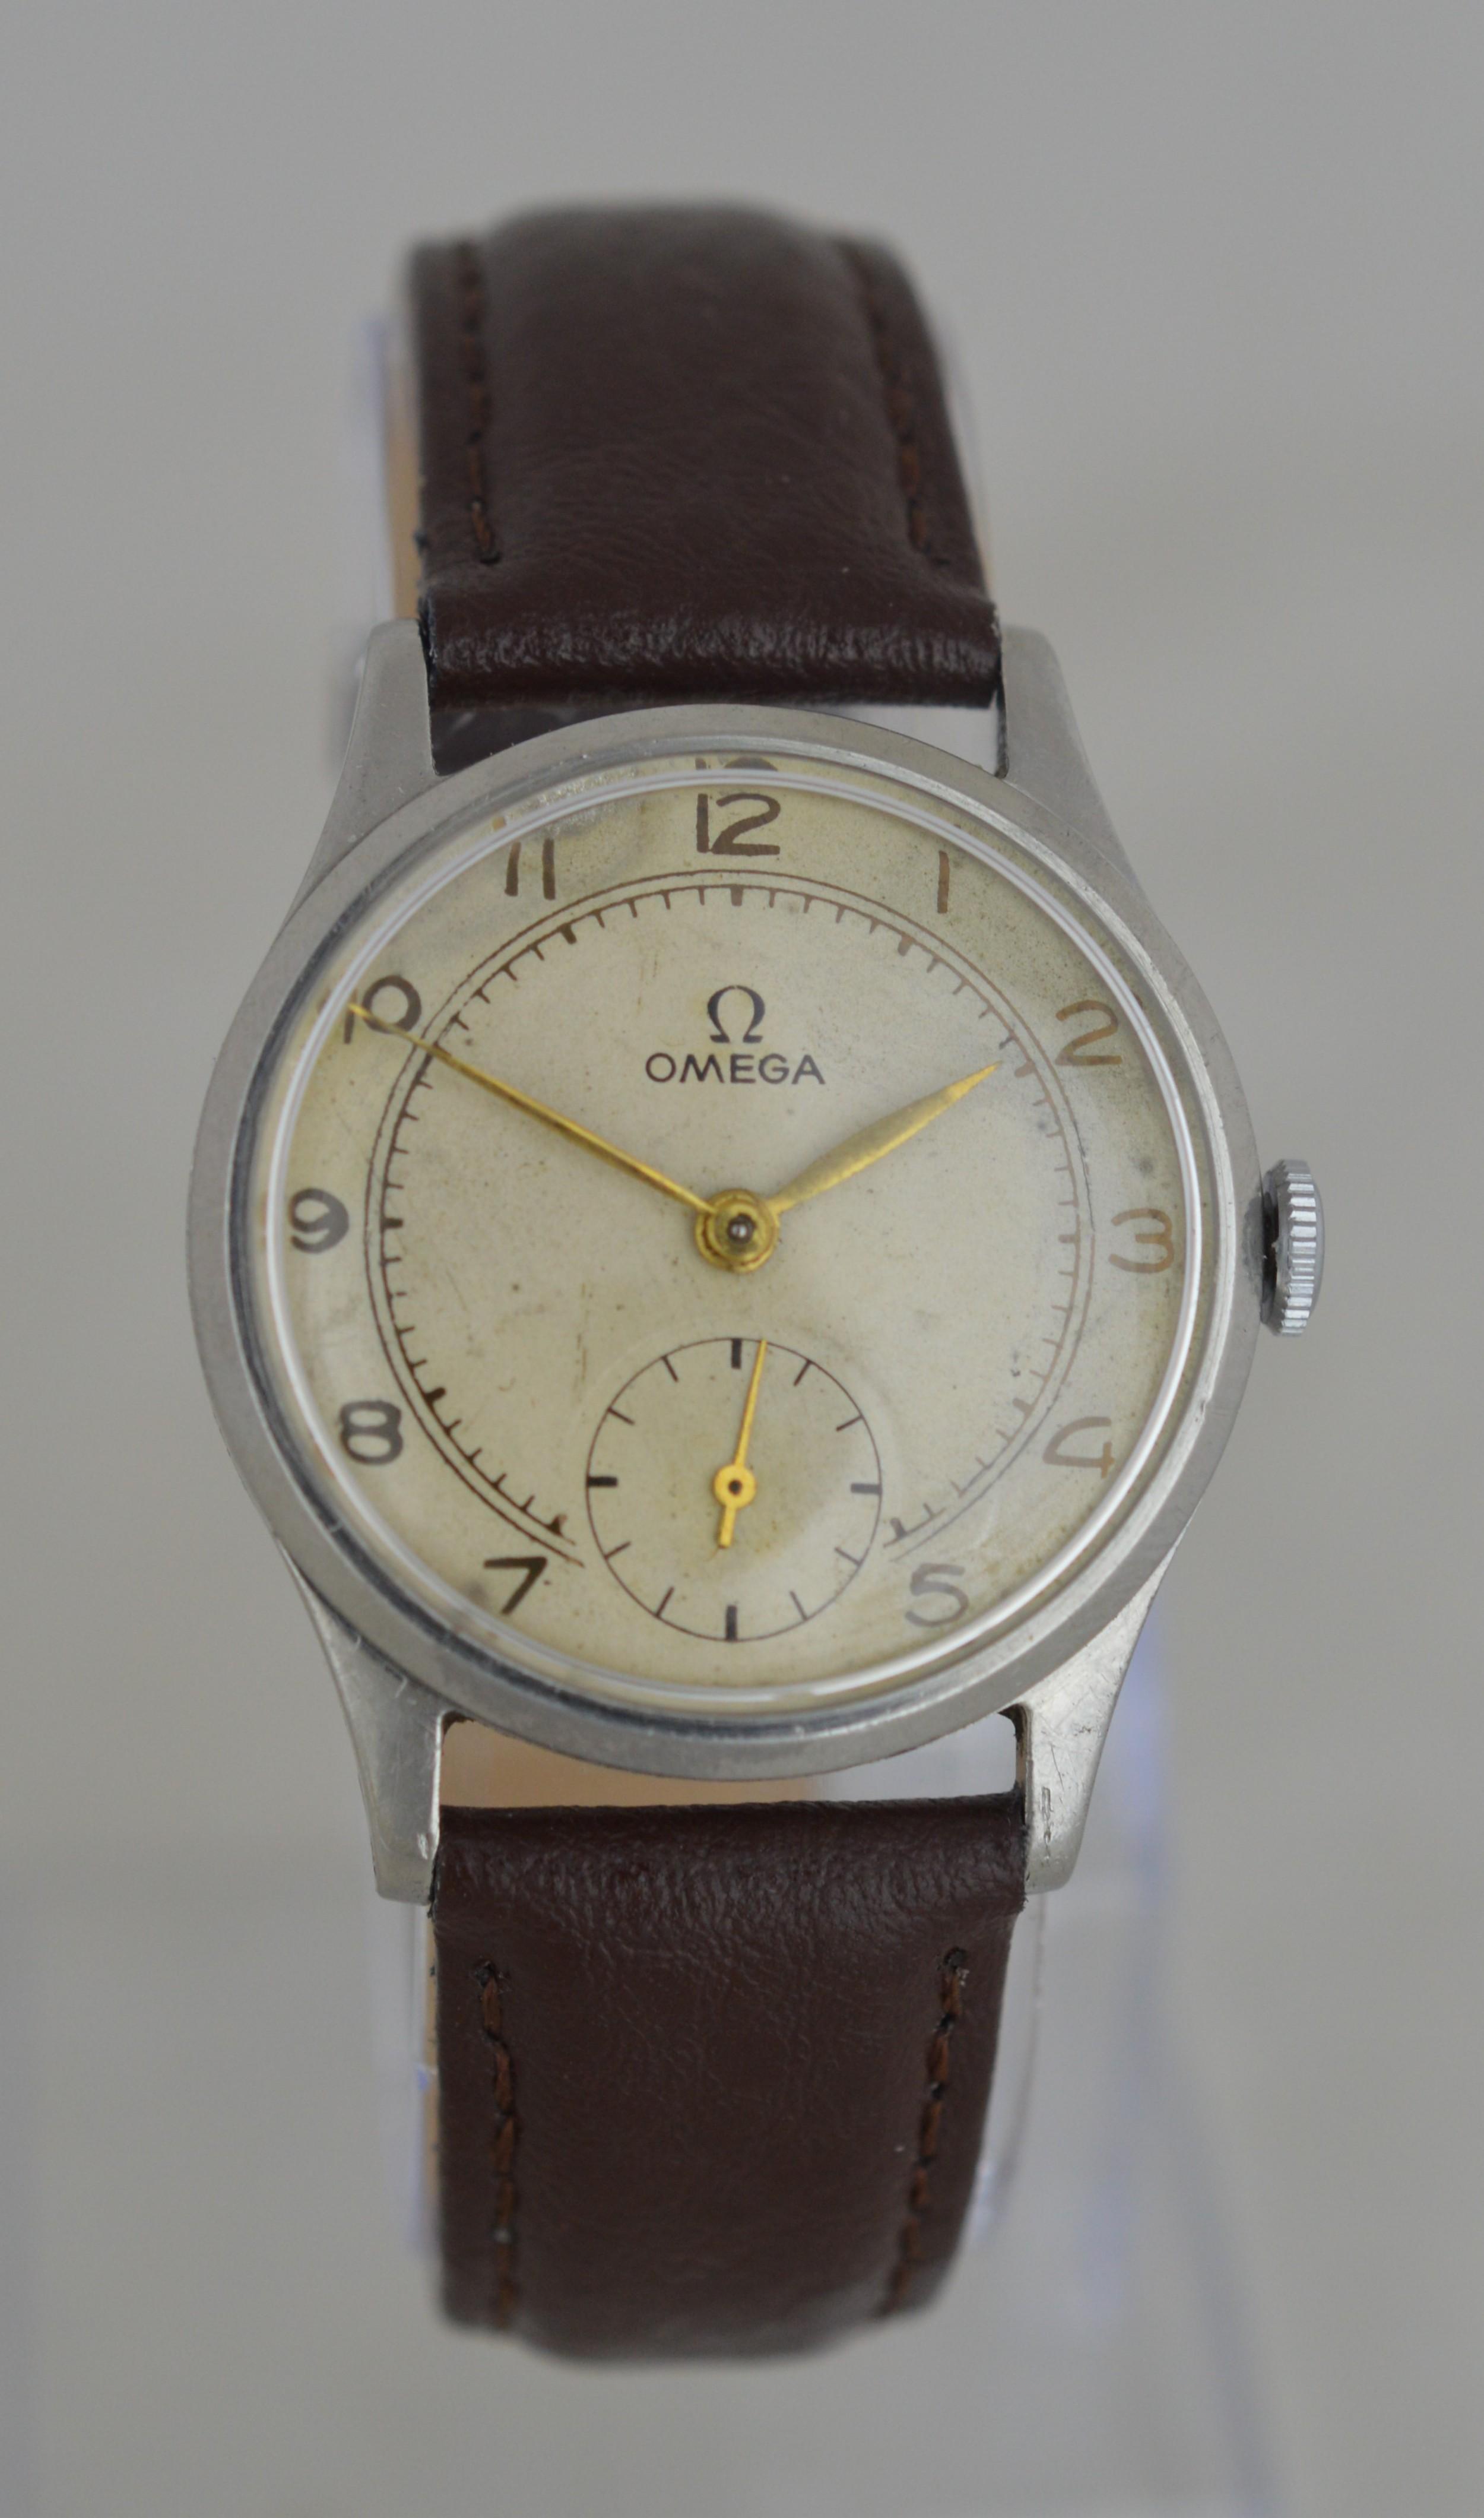 1948 omega 'denisteel' cased wristwatch